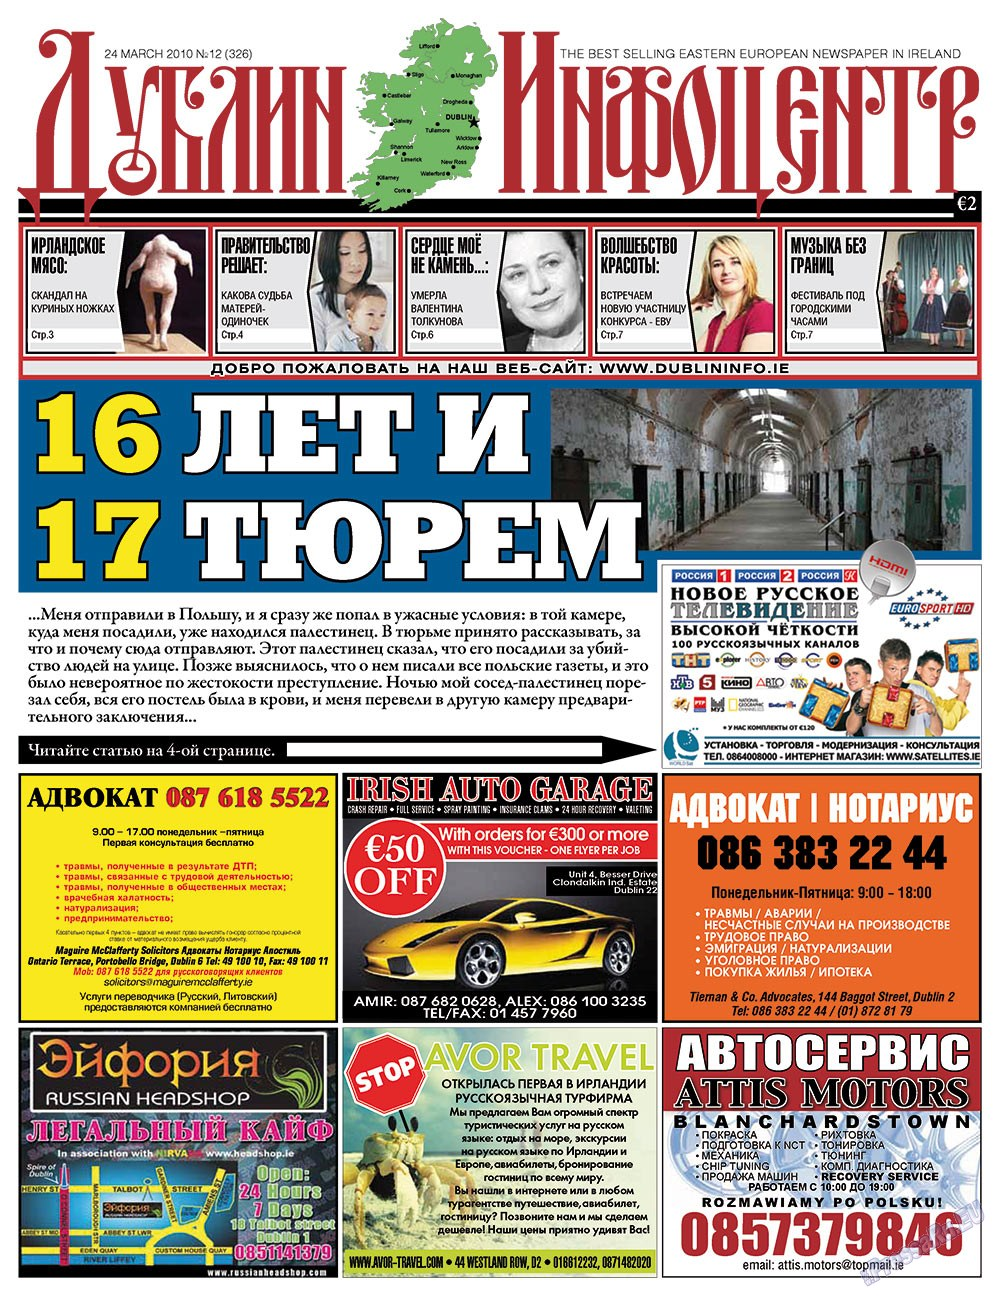 Дублин инфоцентр (газета). 2010 год, номер 12, стр. 1